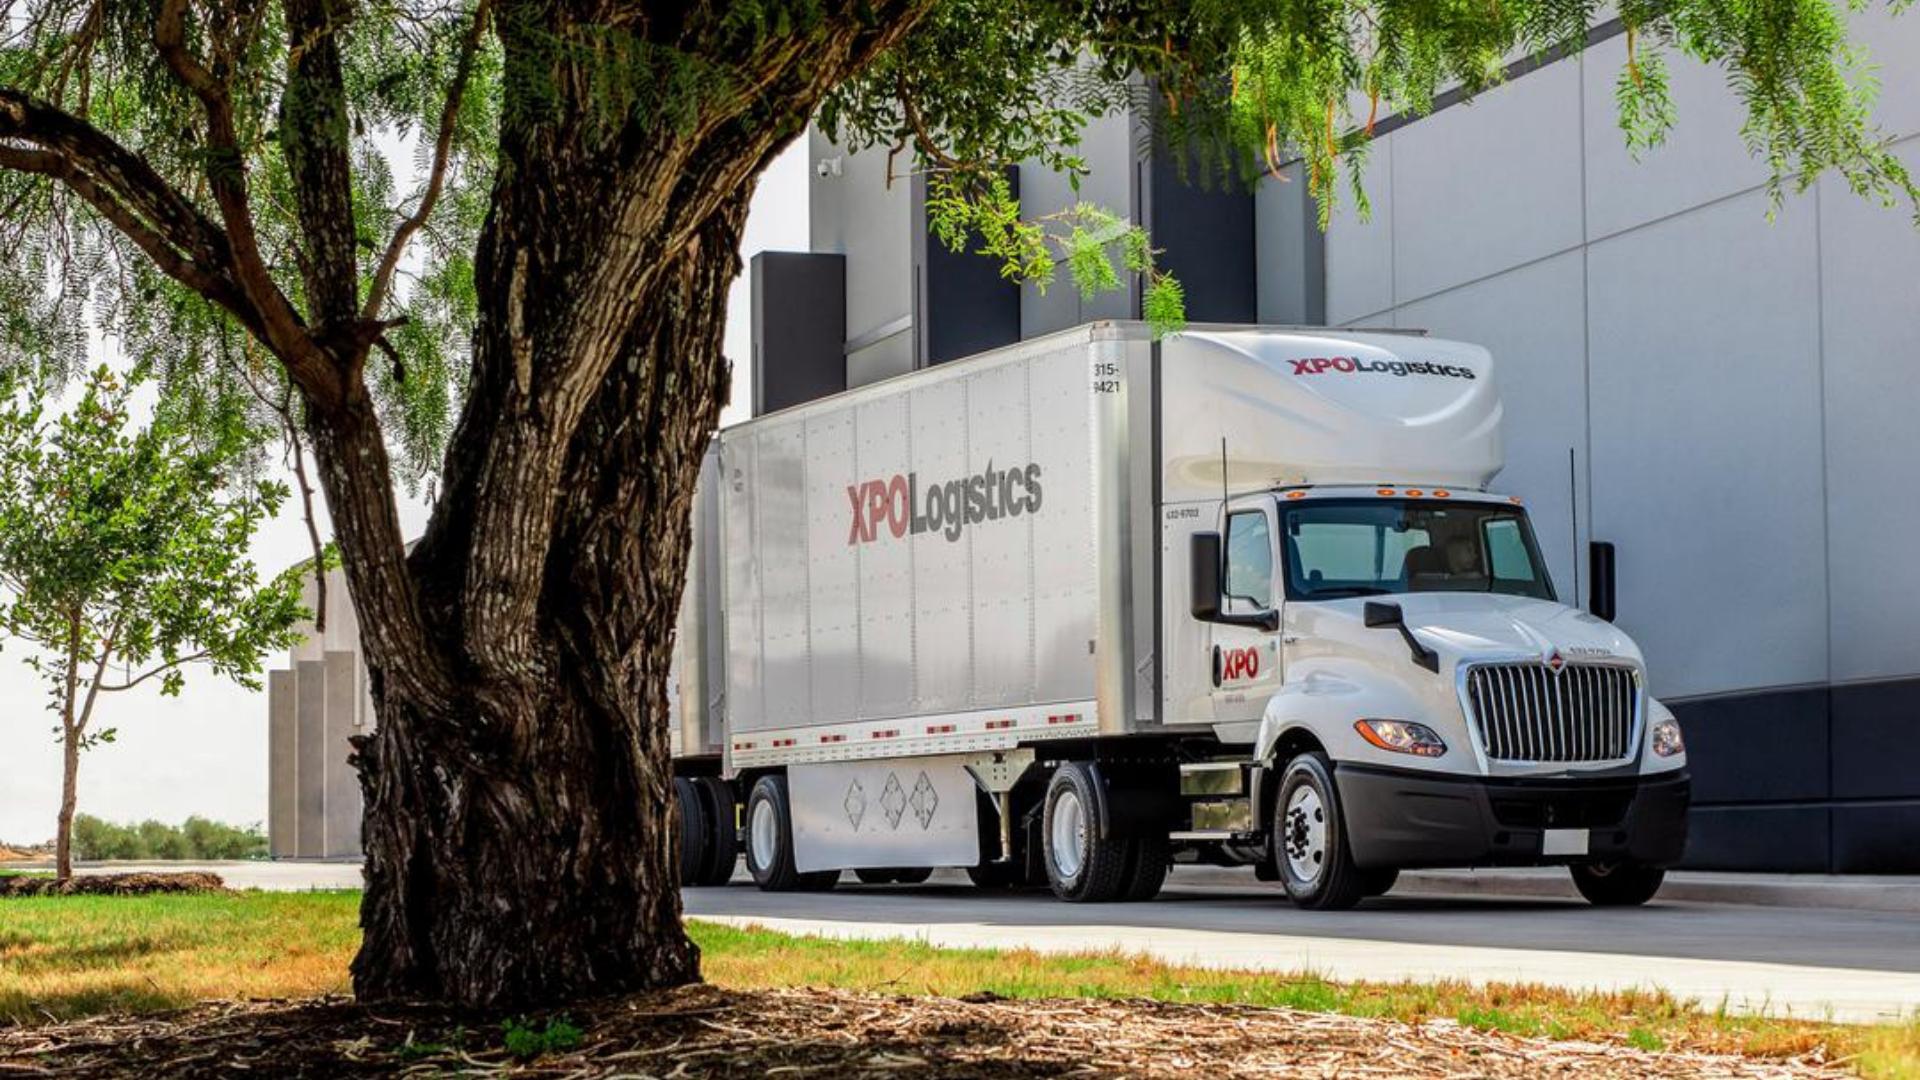 XPO US truck